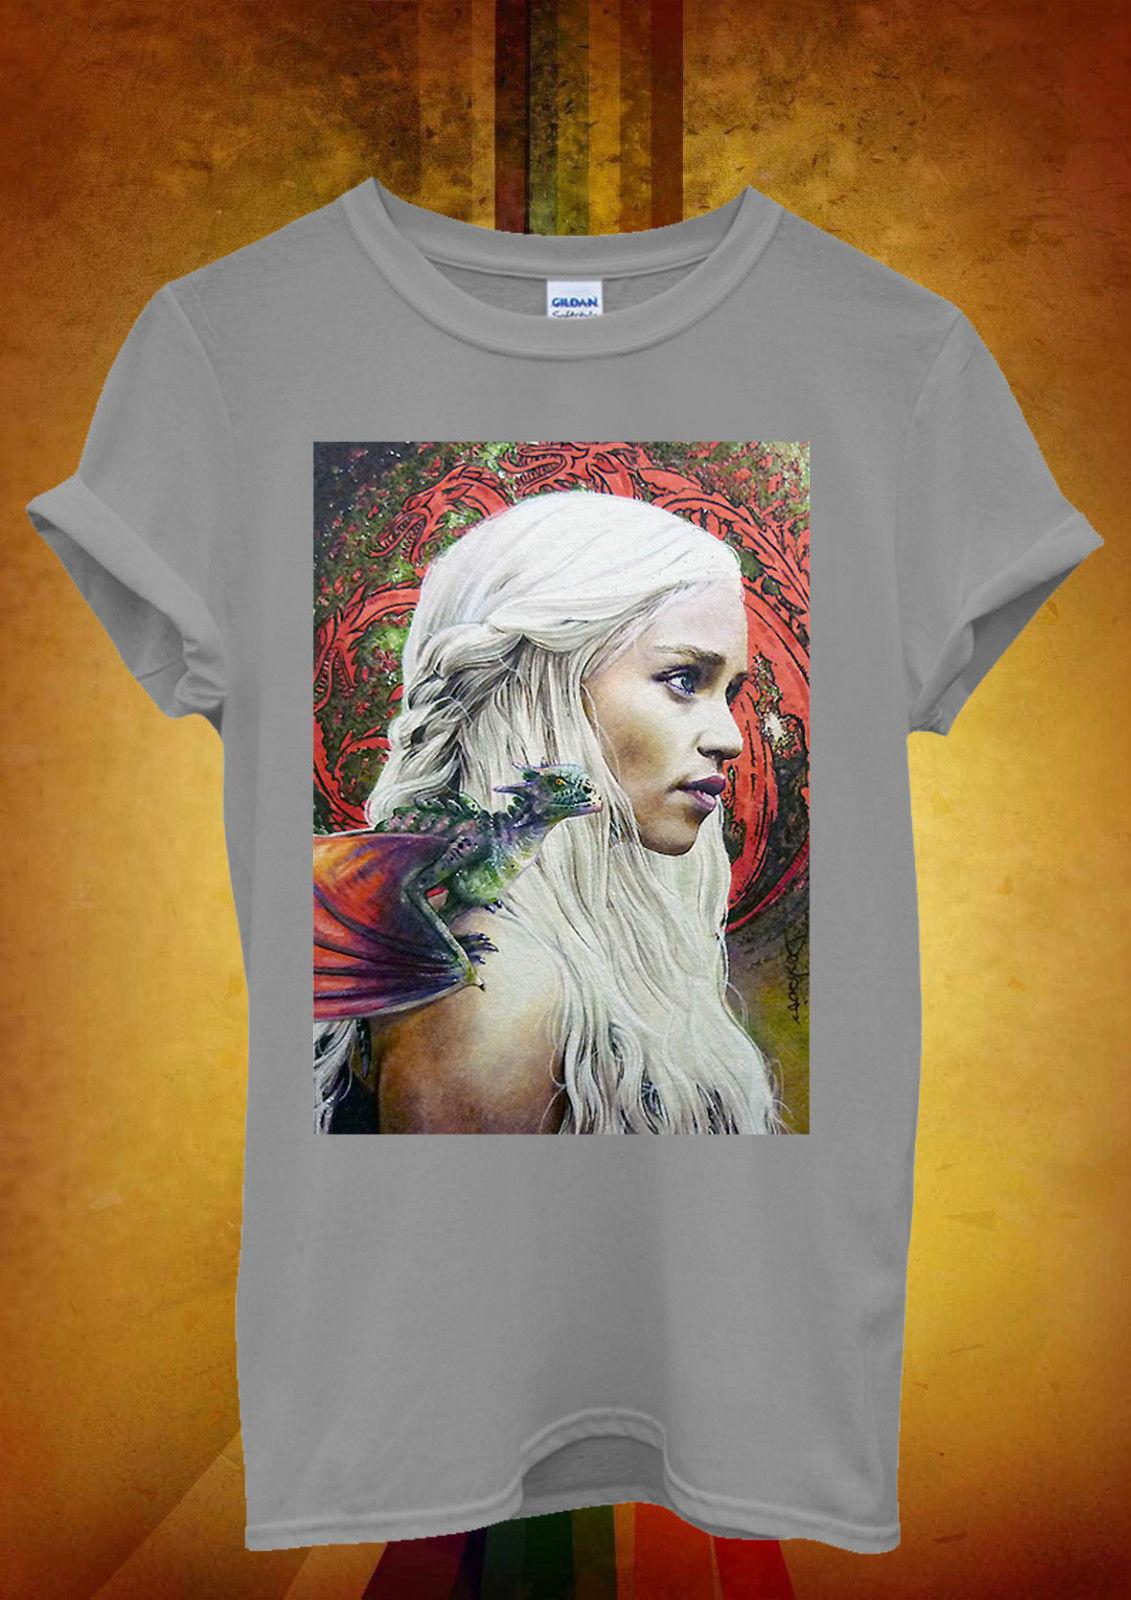 Khaleesi Mother of Dragons Men Women Unisex T Shirt Top Vest 13 New T Shirts Funny Tops Tee New Unisex Funny Tops in T Shirts from Men 39 s Clothing